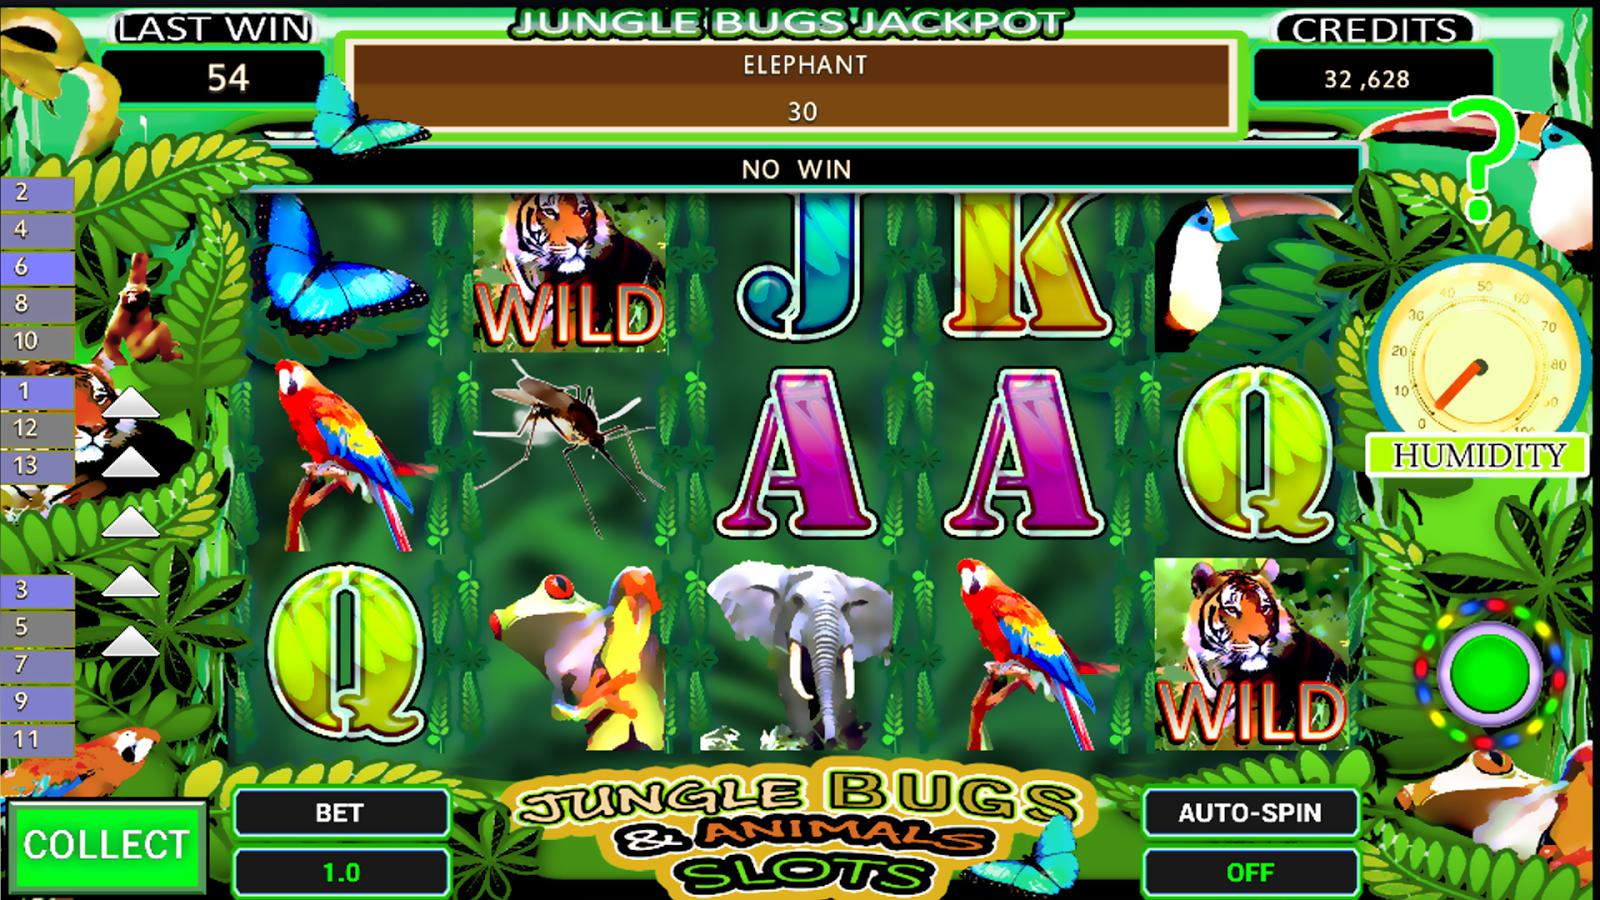 Bugs slot machine